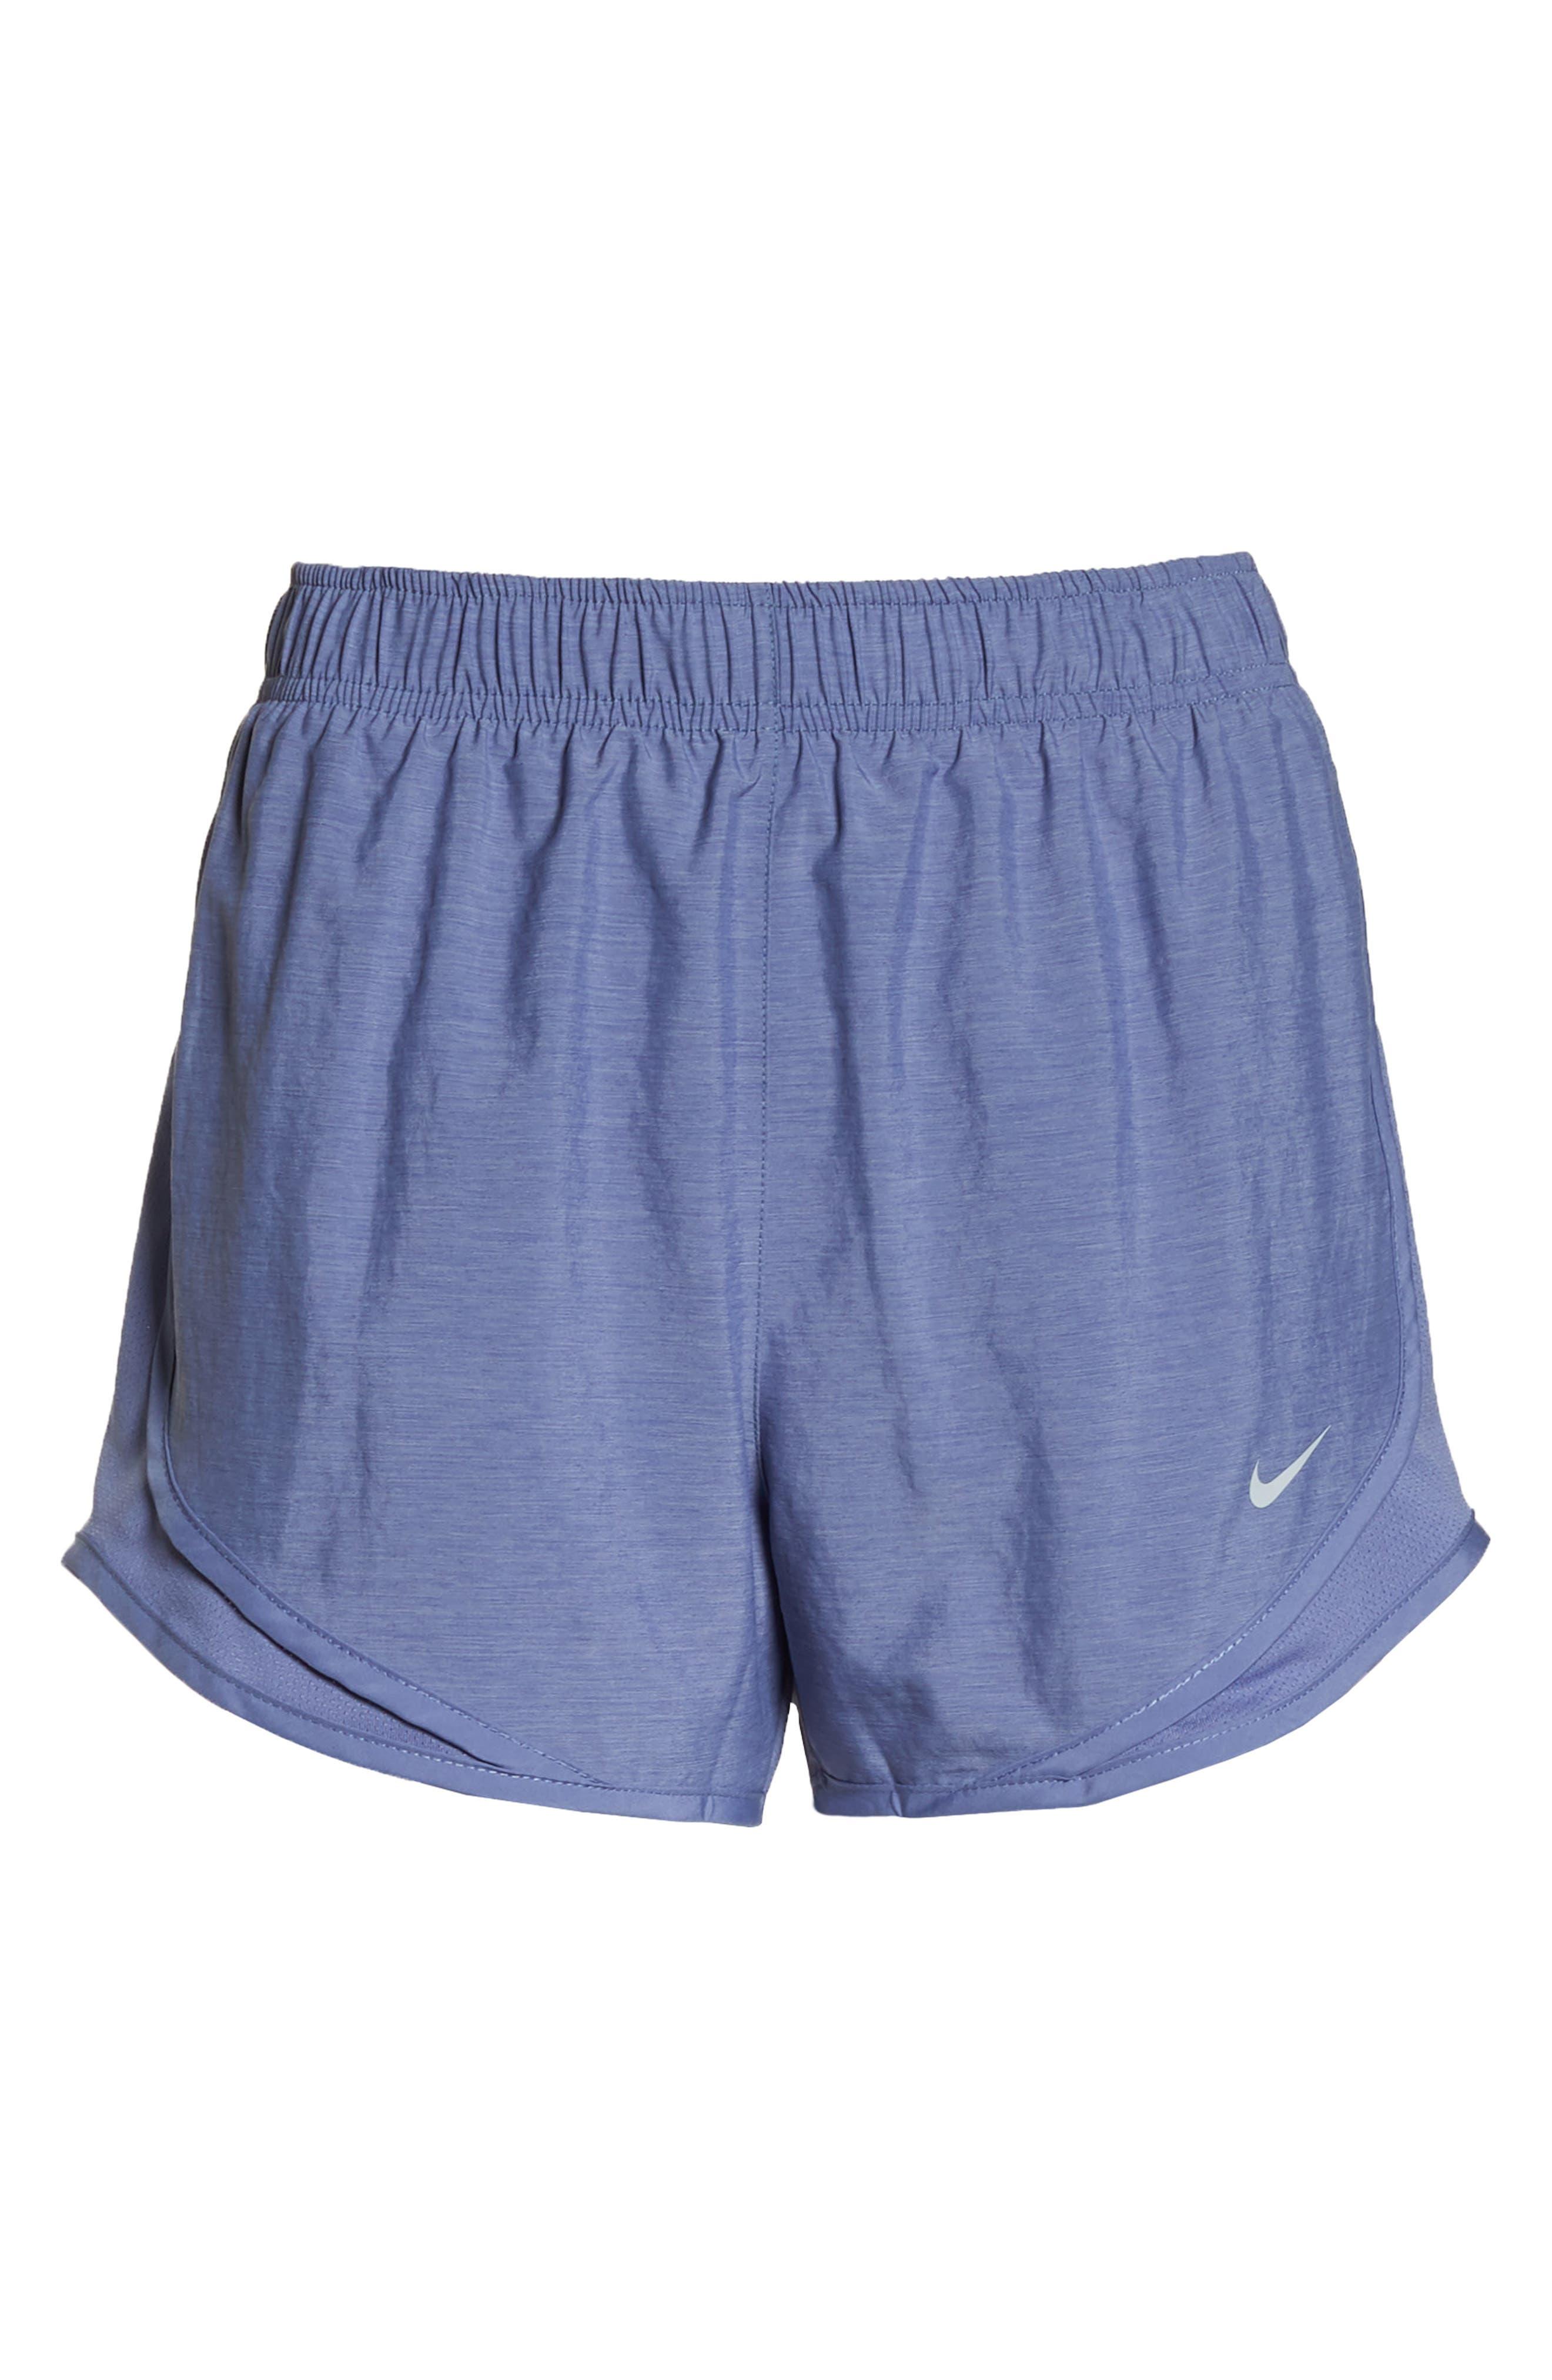 Dry Tempo Running Shorts,                             Alternate thumbnail 436, color,